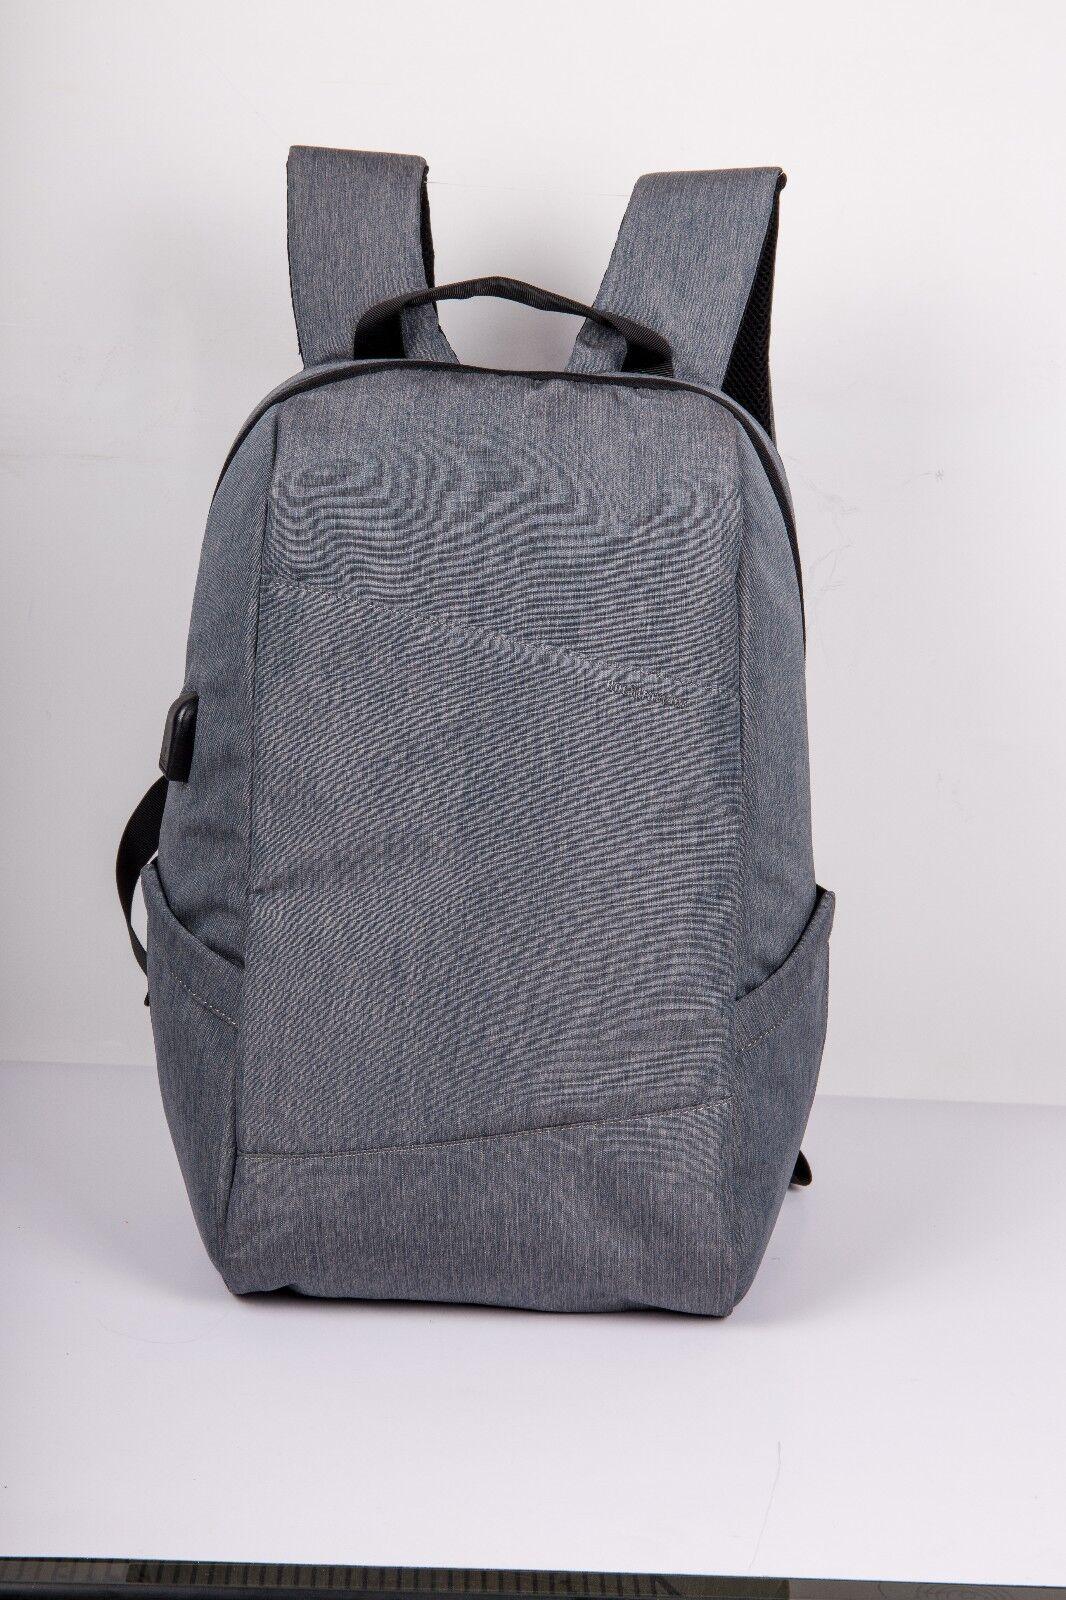 "New Rocktraveler RTL17 Leisure Anti-theft Backpack Lap Top Bag-for 15.6""laptop"